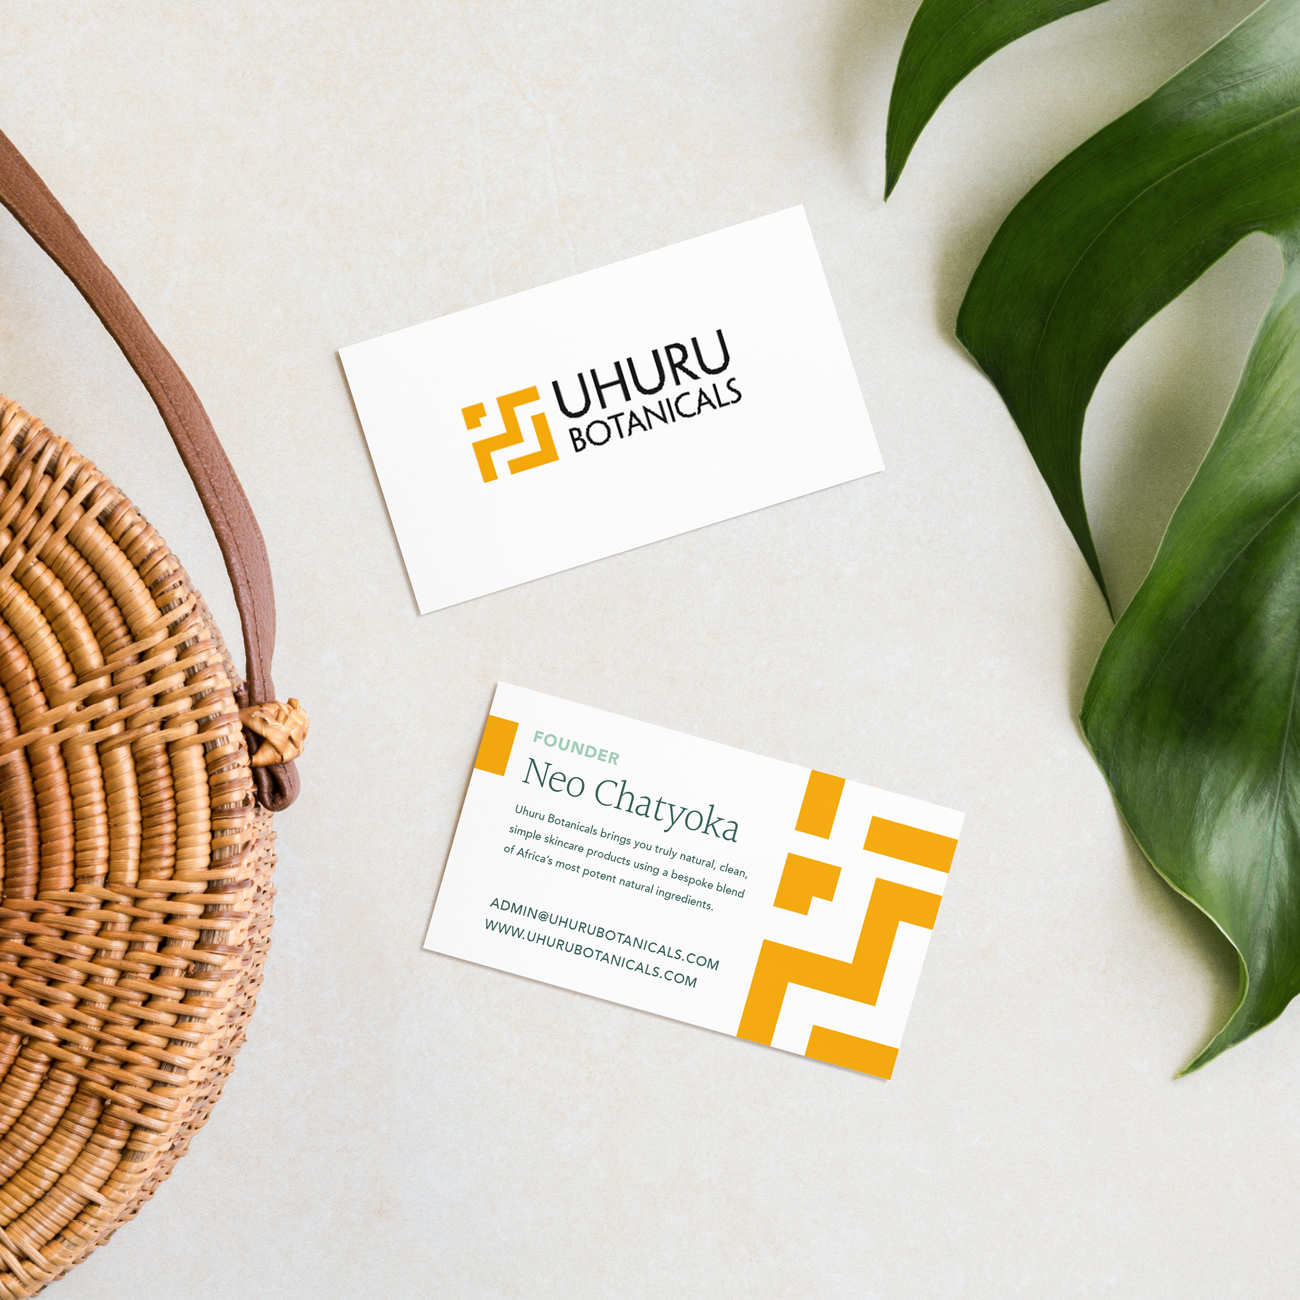 uhuru-botanicals-business-card-design-studio-77-london.jpg